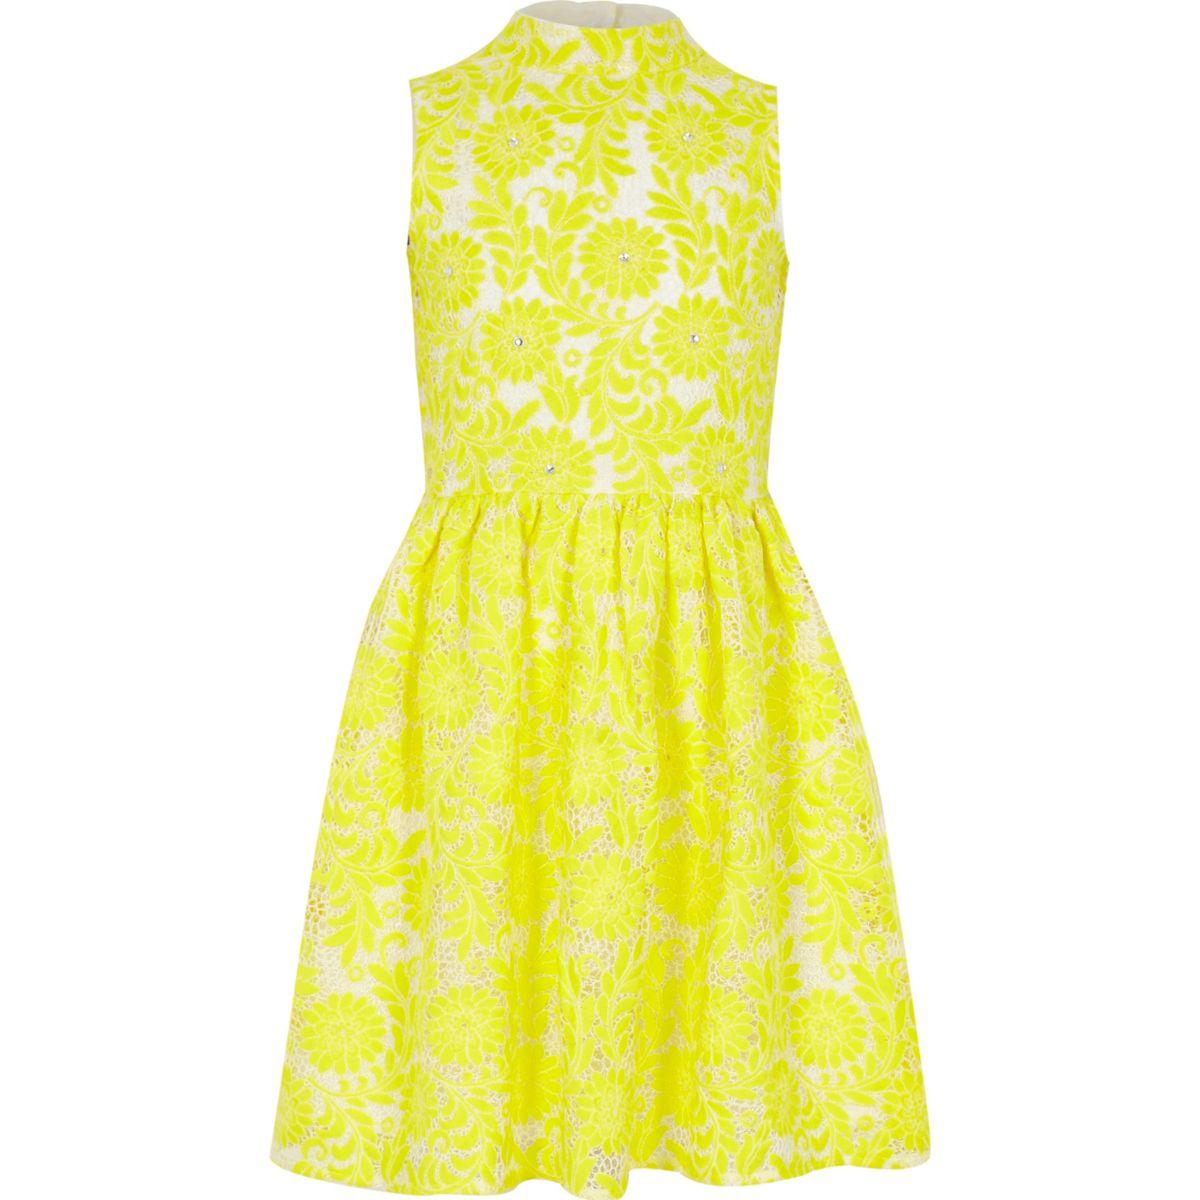 Girls yellow high neck lace prom dress